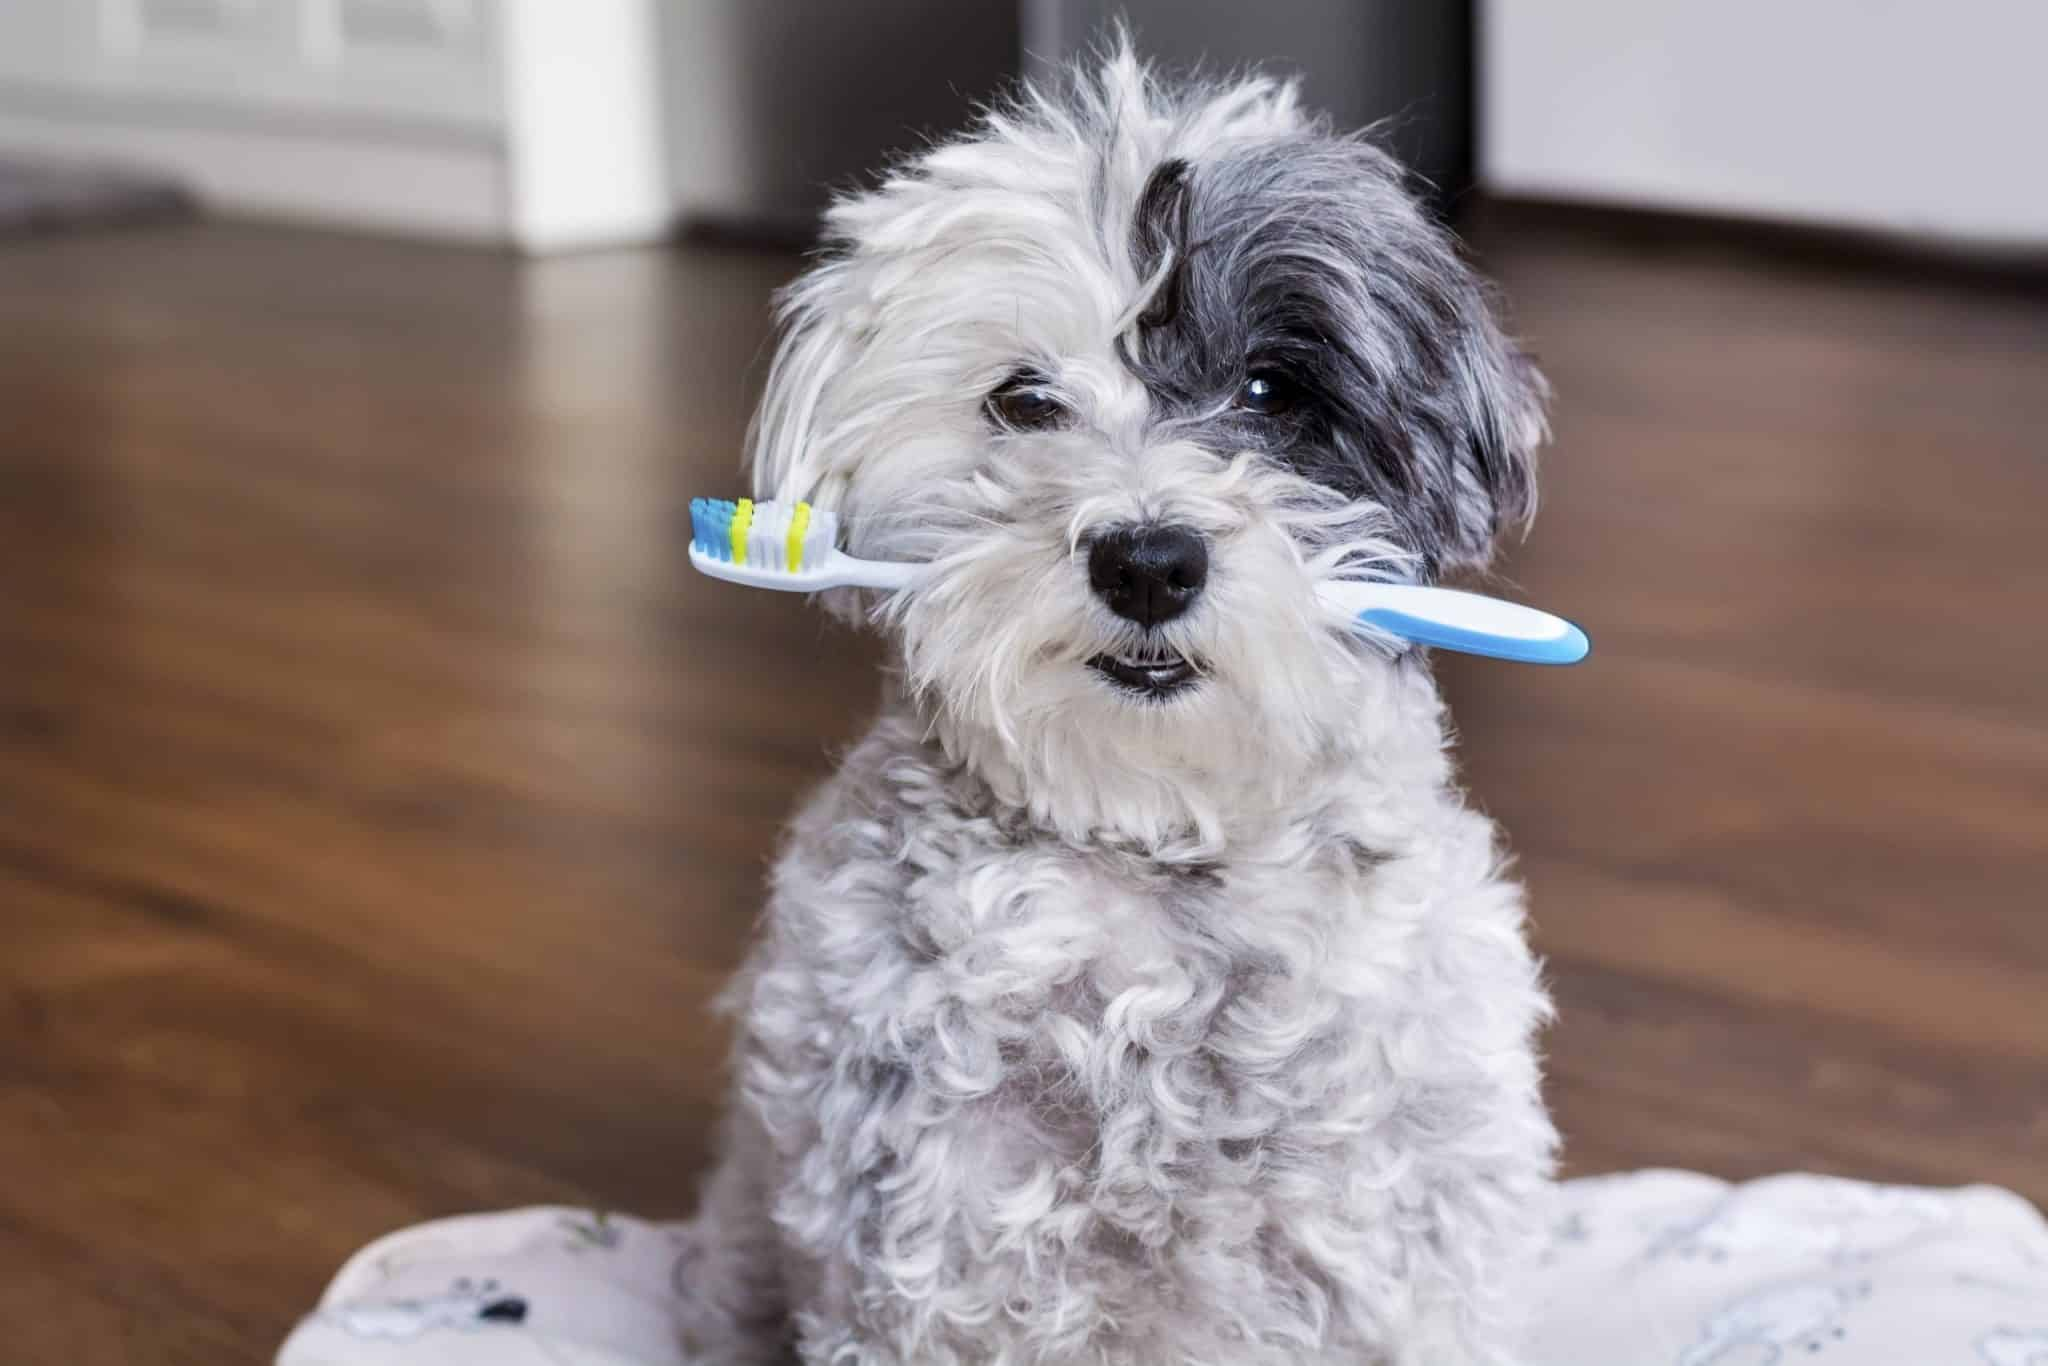 Dog holding toothbrush